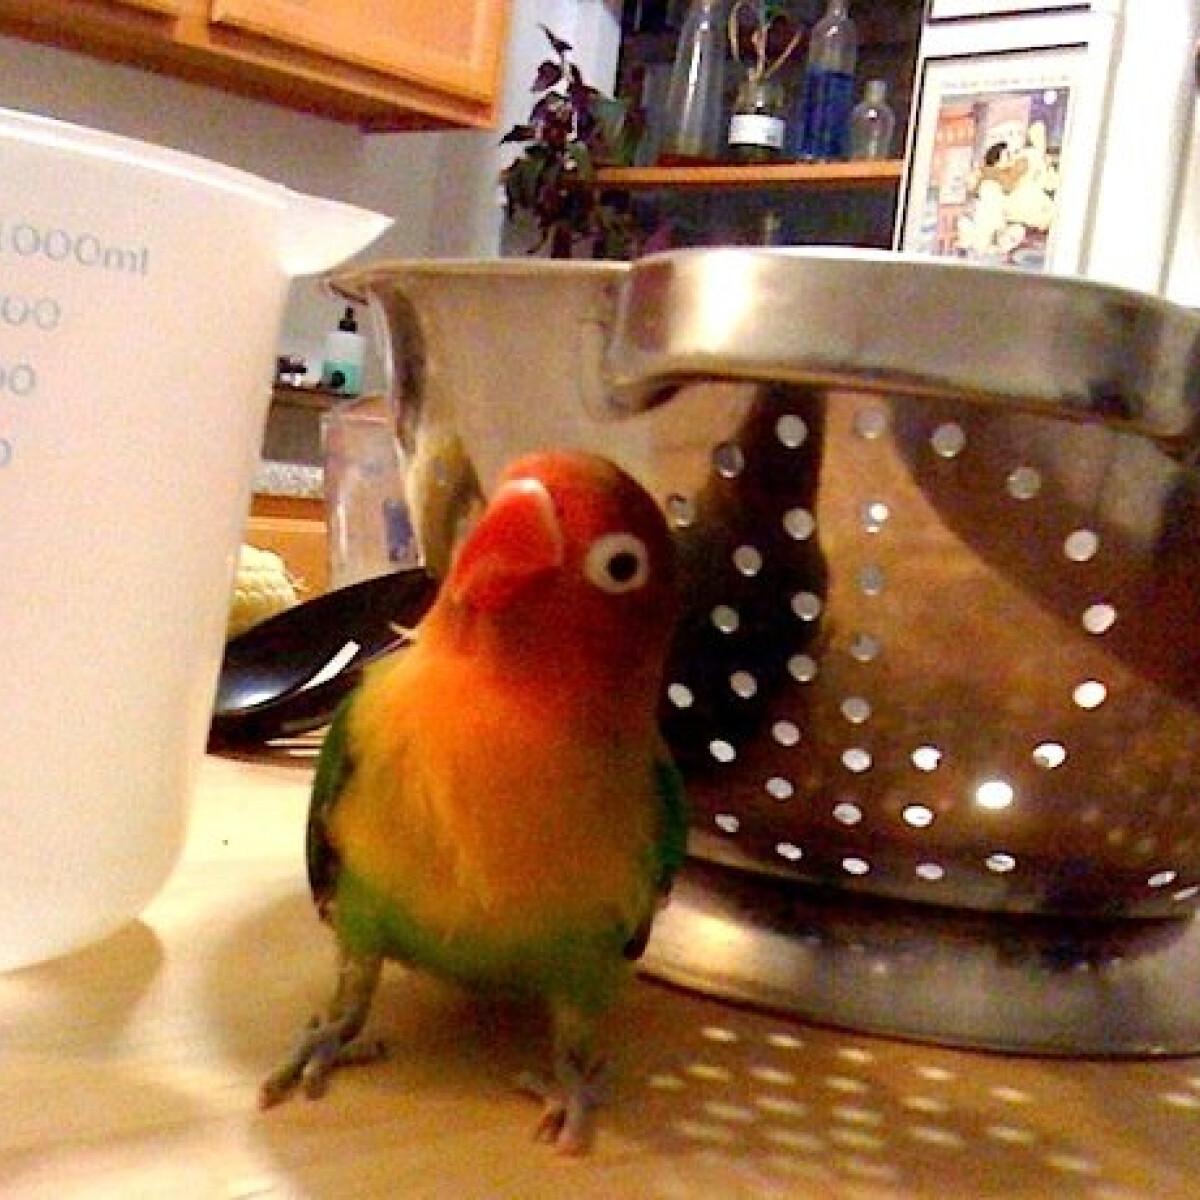 Ne tarts papagájt a konyhában, veszélyes!